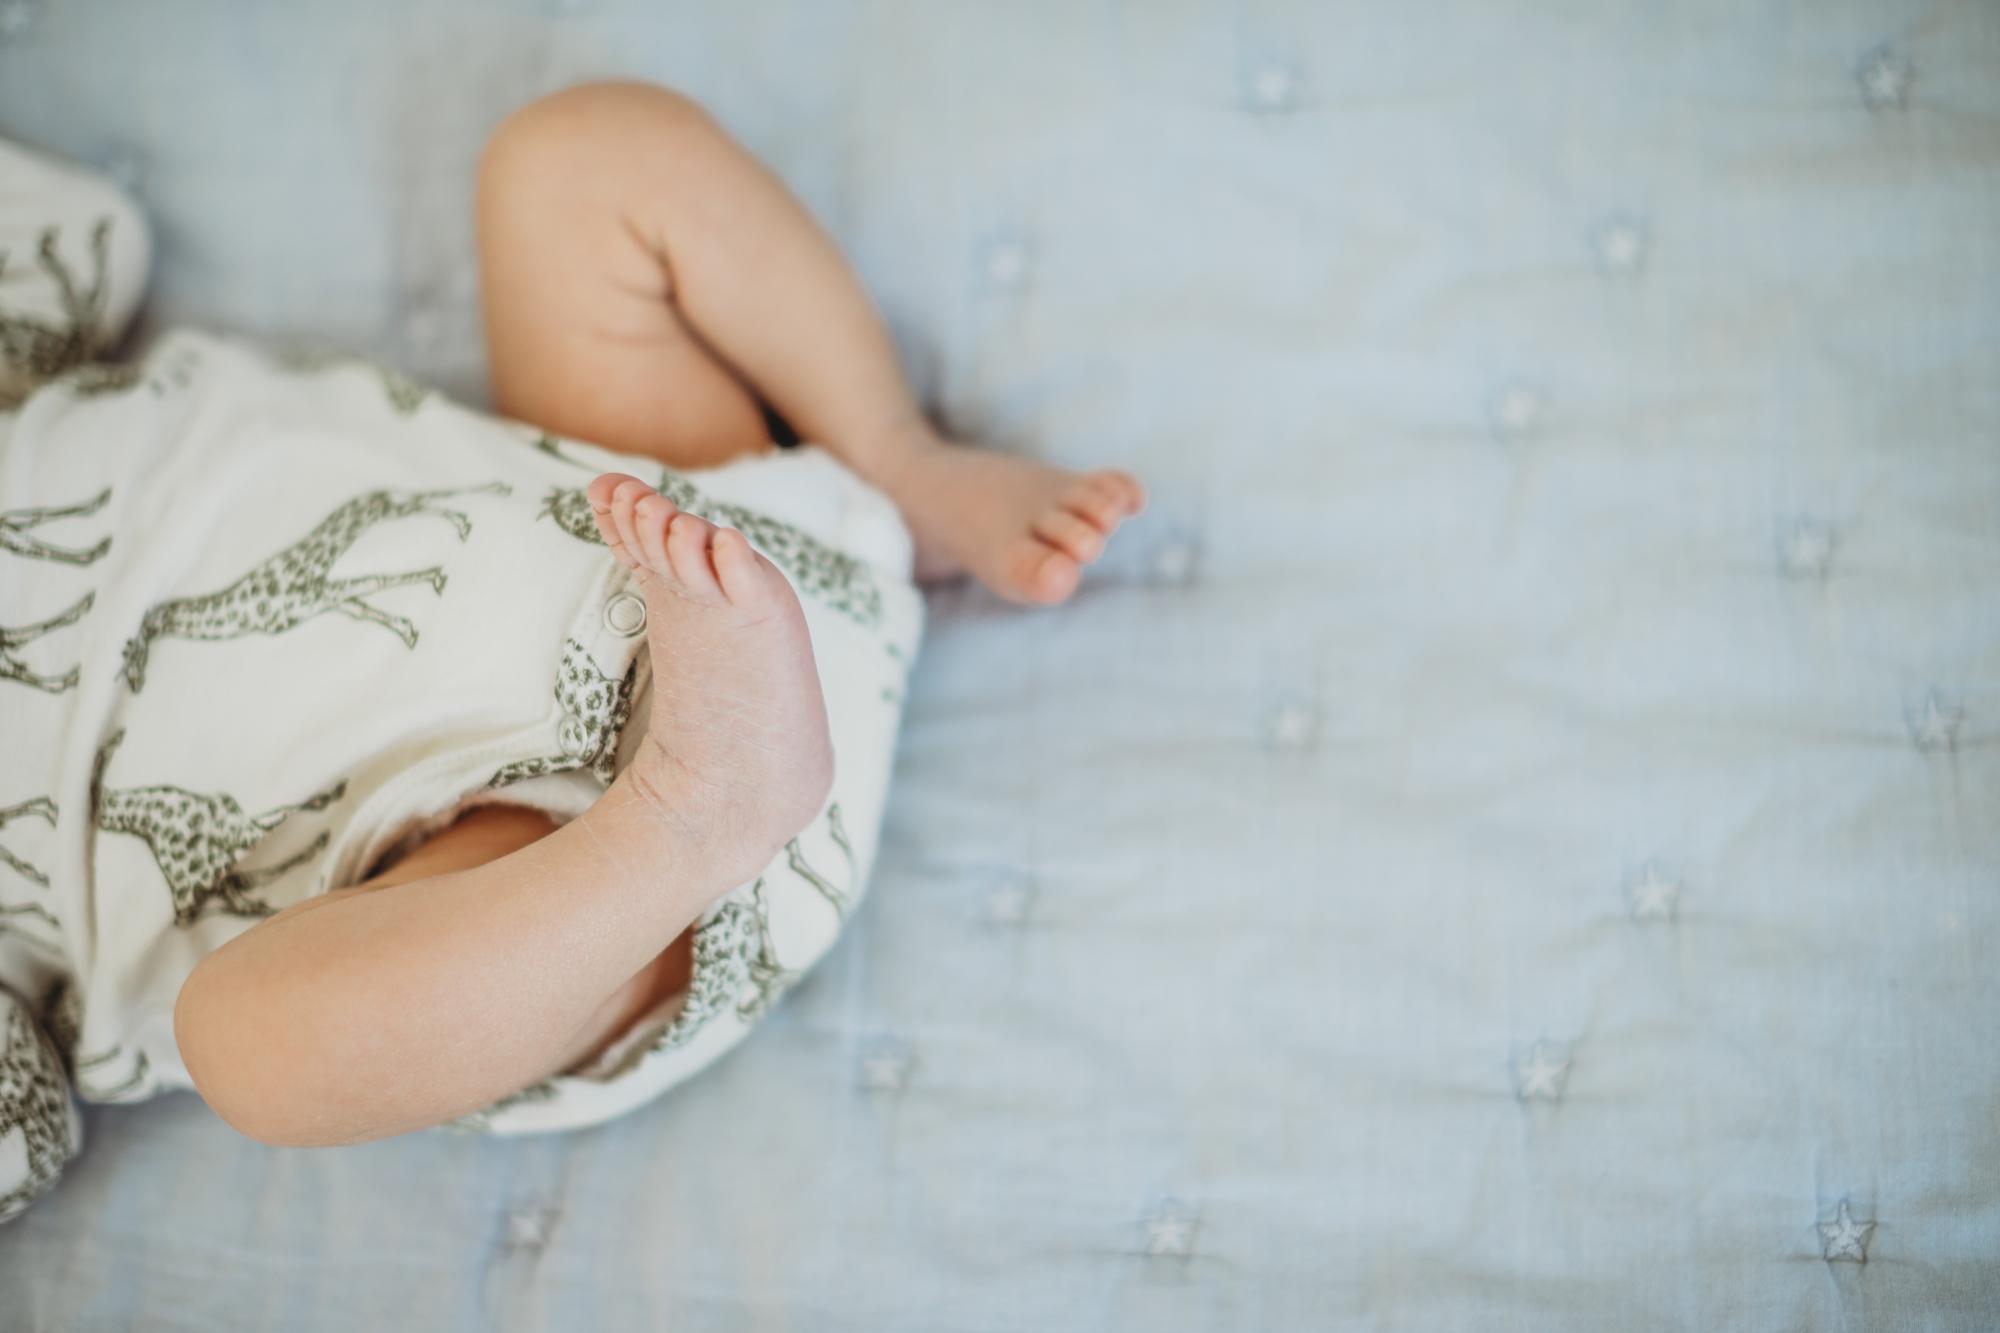 Boston-Newborn-Photographer-Framingham-Peaceful-In-Home-Session-24.jpg